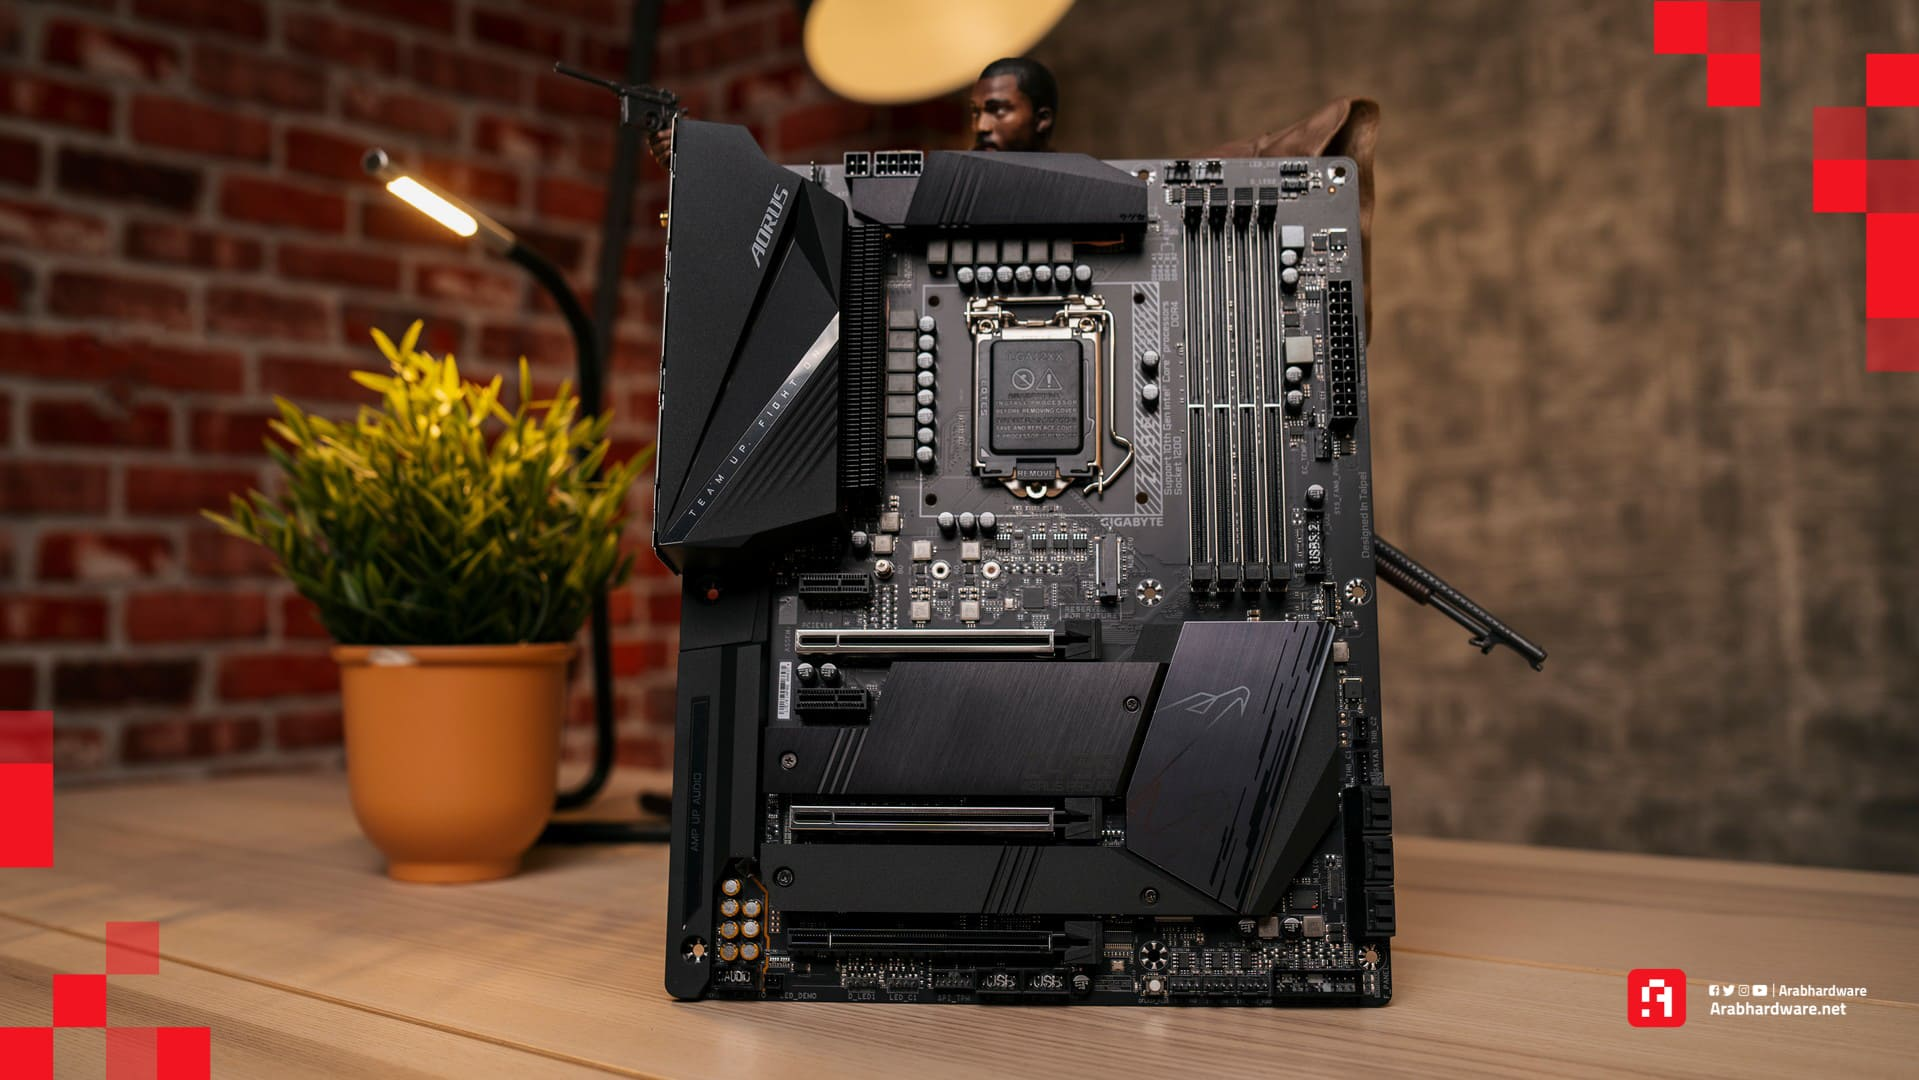 Z490 AORUS من شركة Gigabyte ، مع Unboxing عرب Intel انتل جيجابايت